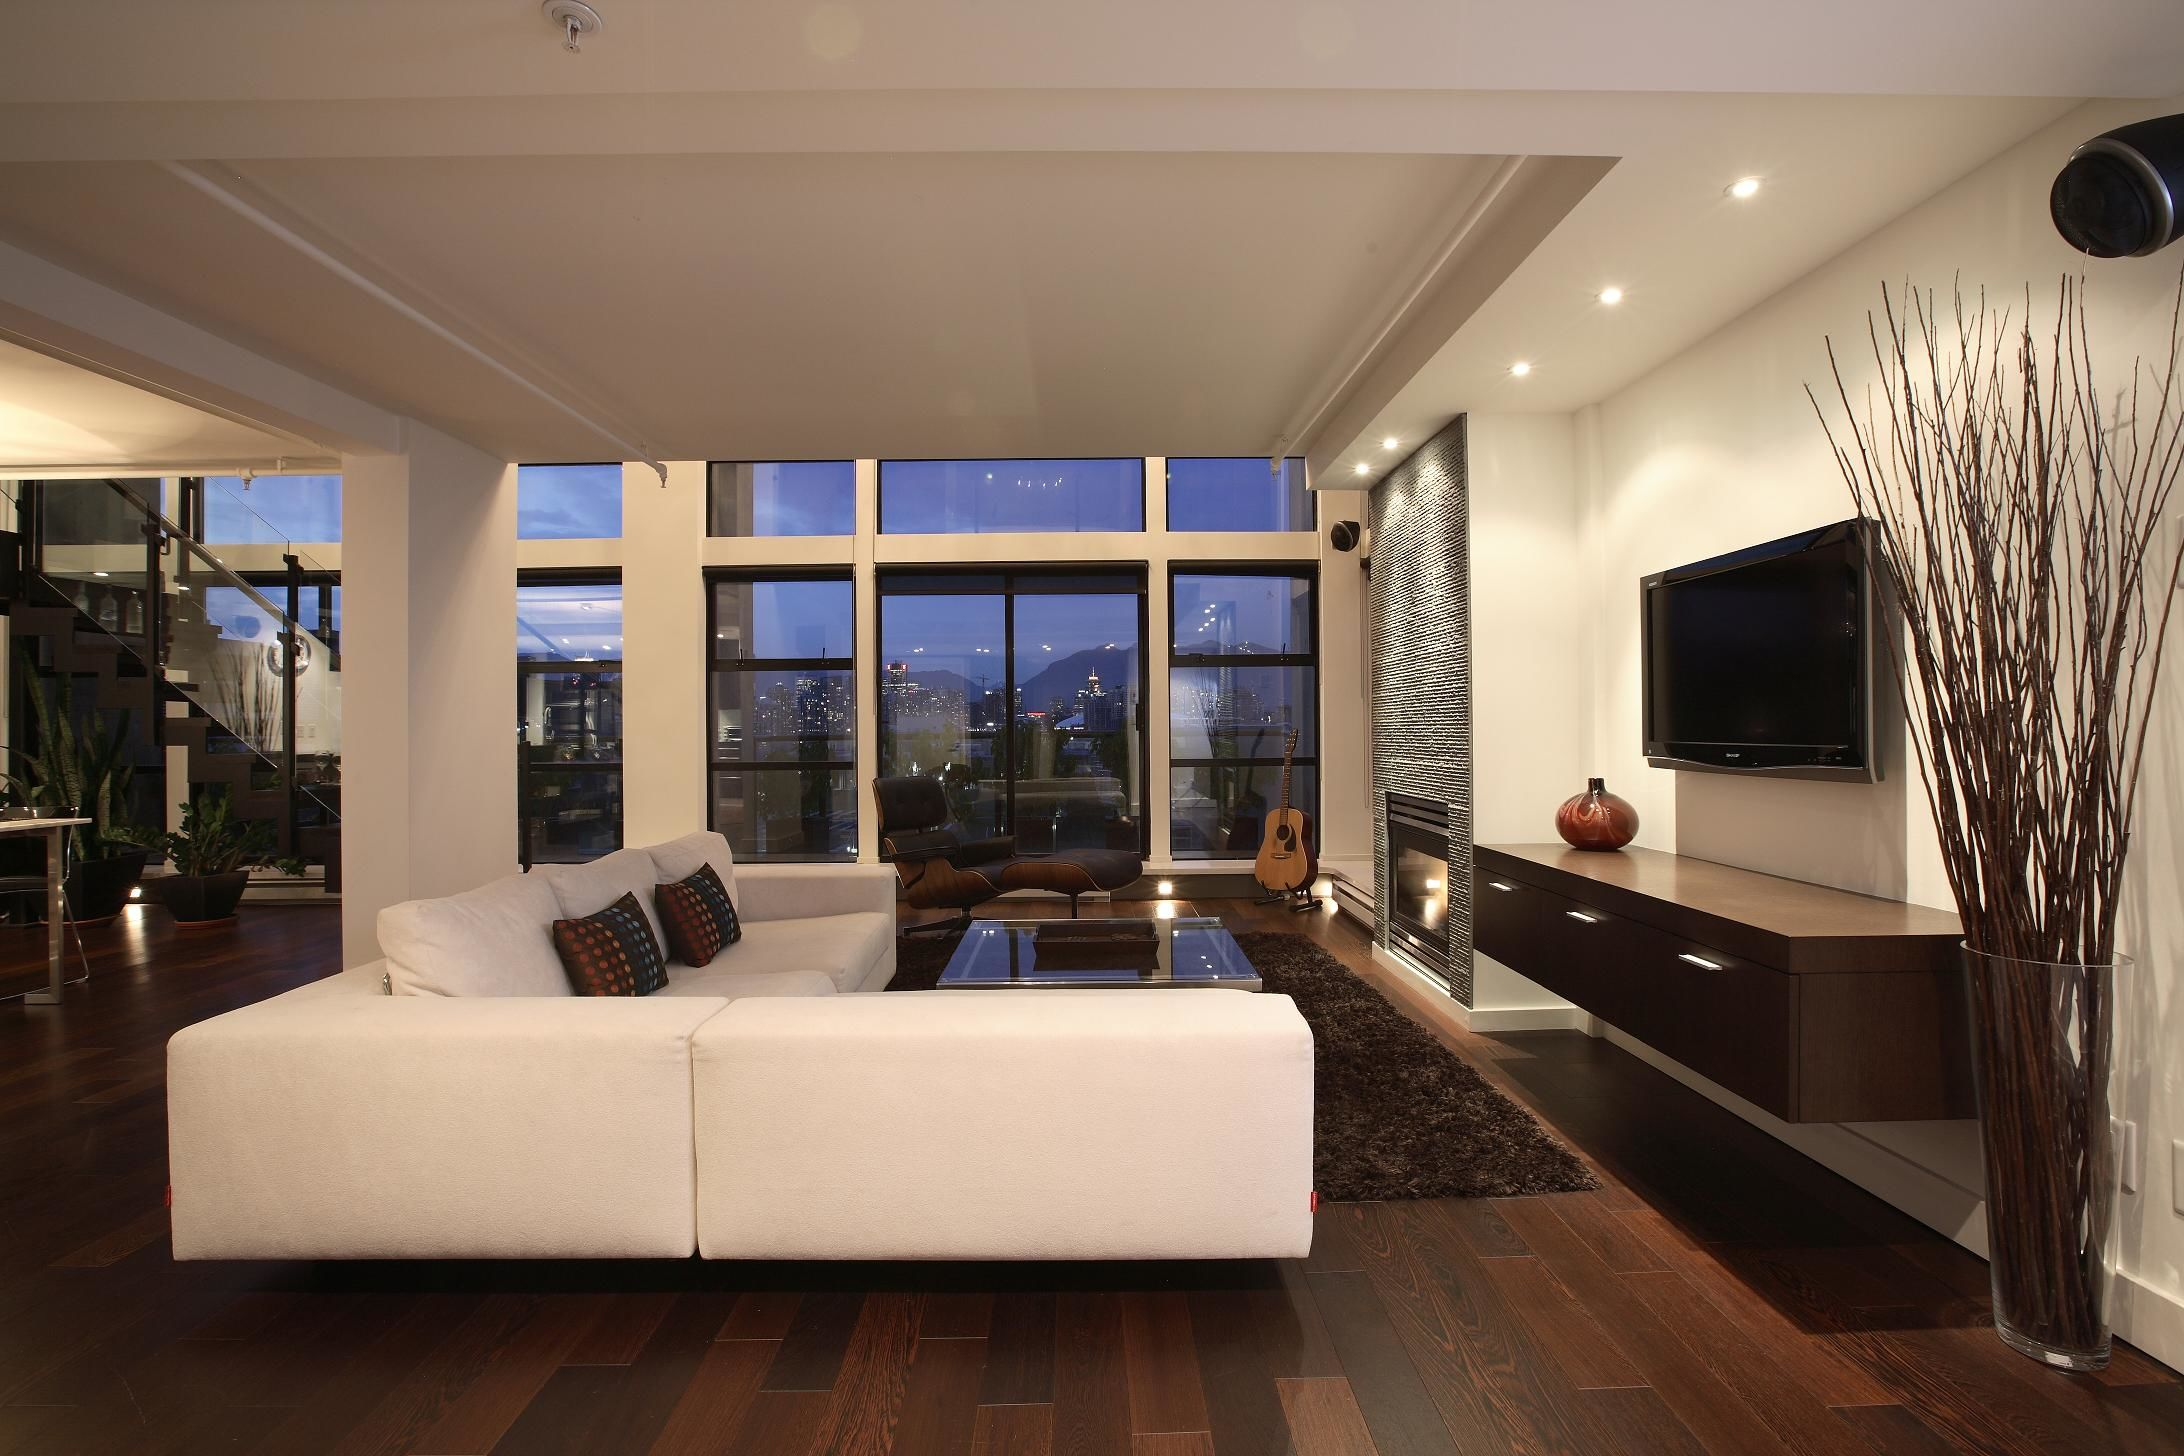 simple and modern style sofa ideas